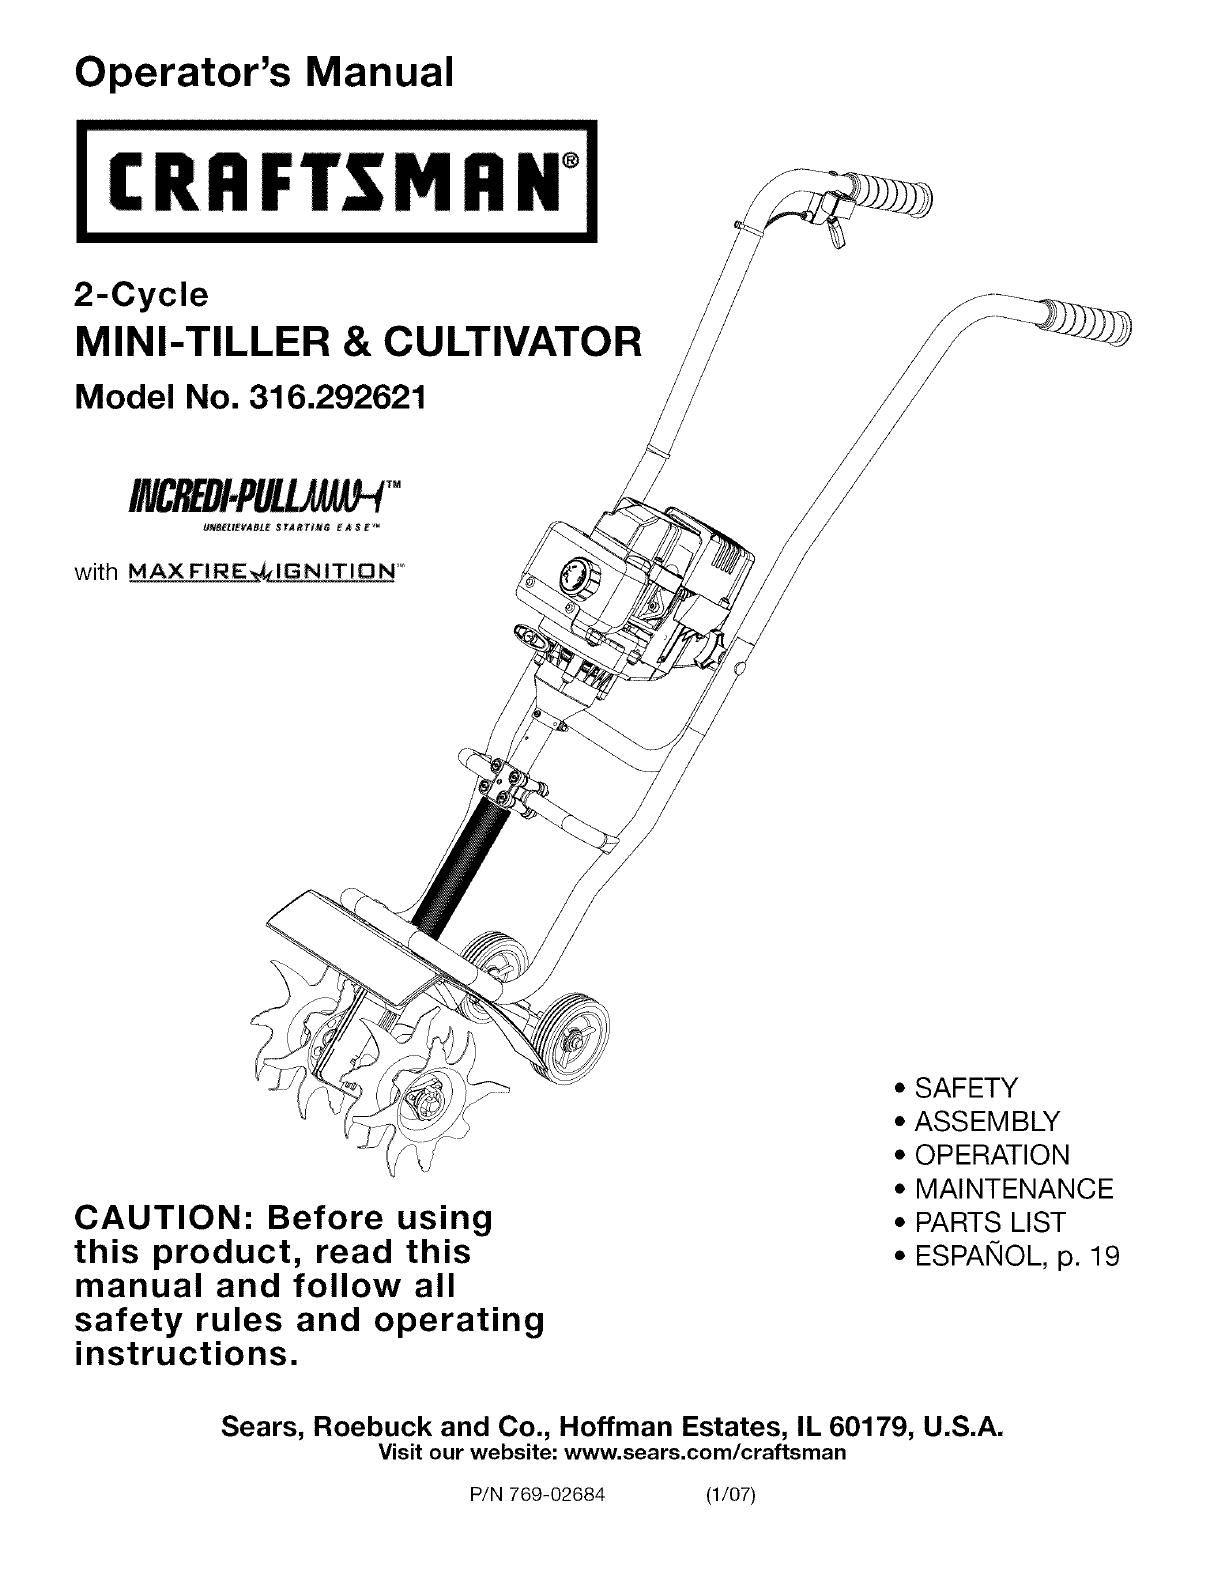 Craftsman 316292621 User Manual Mini Tiller  Cultivator